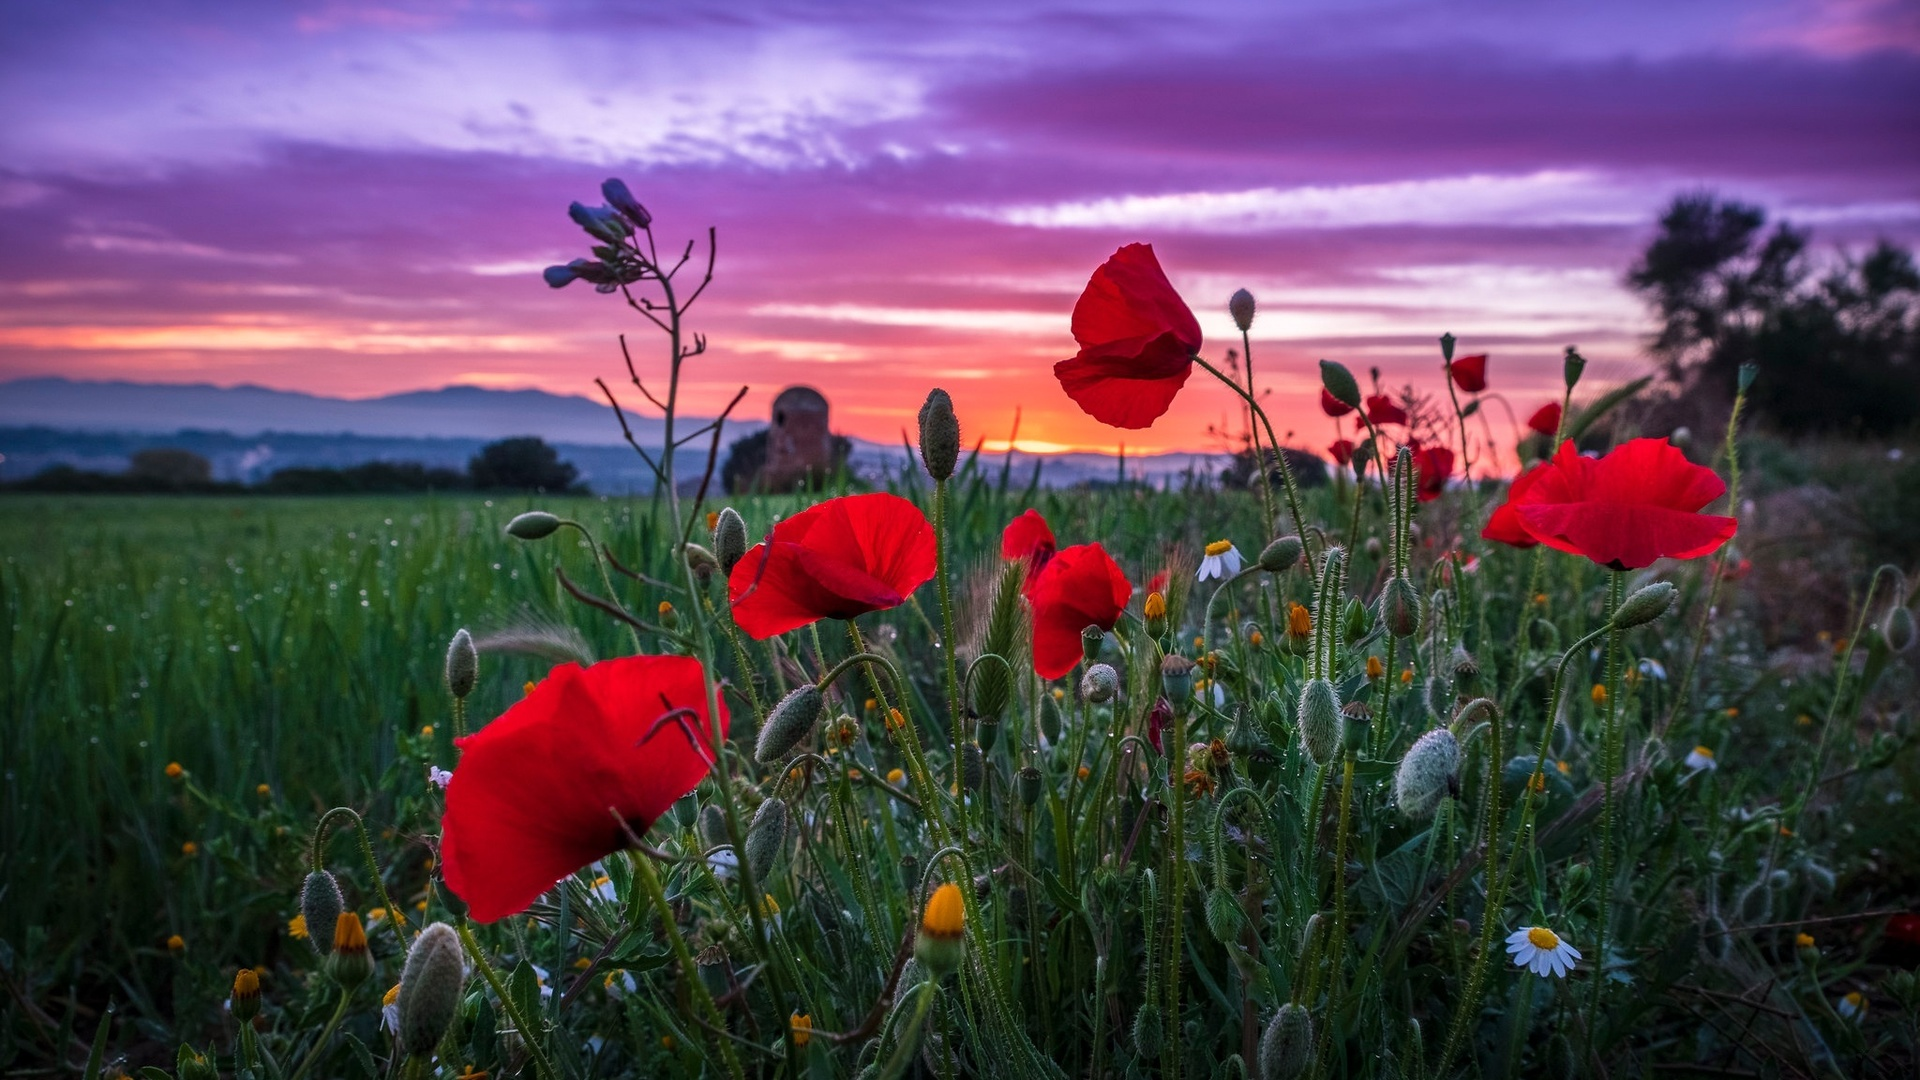 природа, пейзаж, лето, поле, трава, цветы, маки, ромашки, закат, вечер